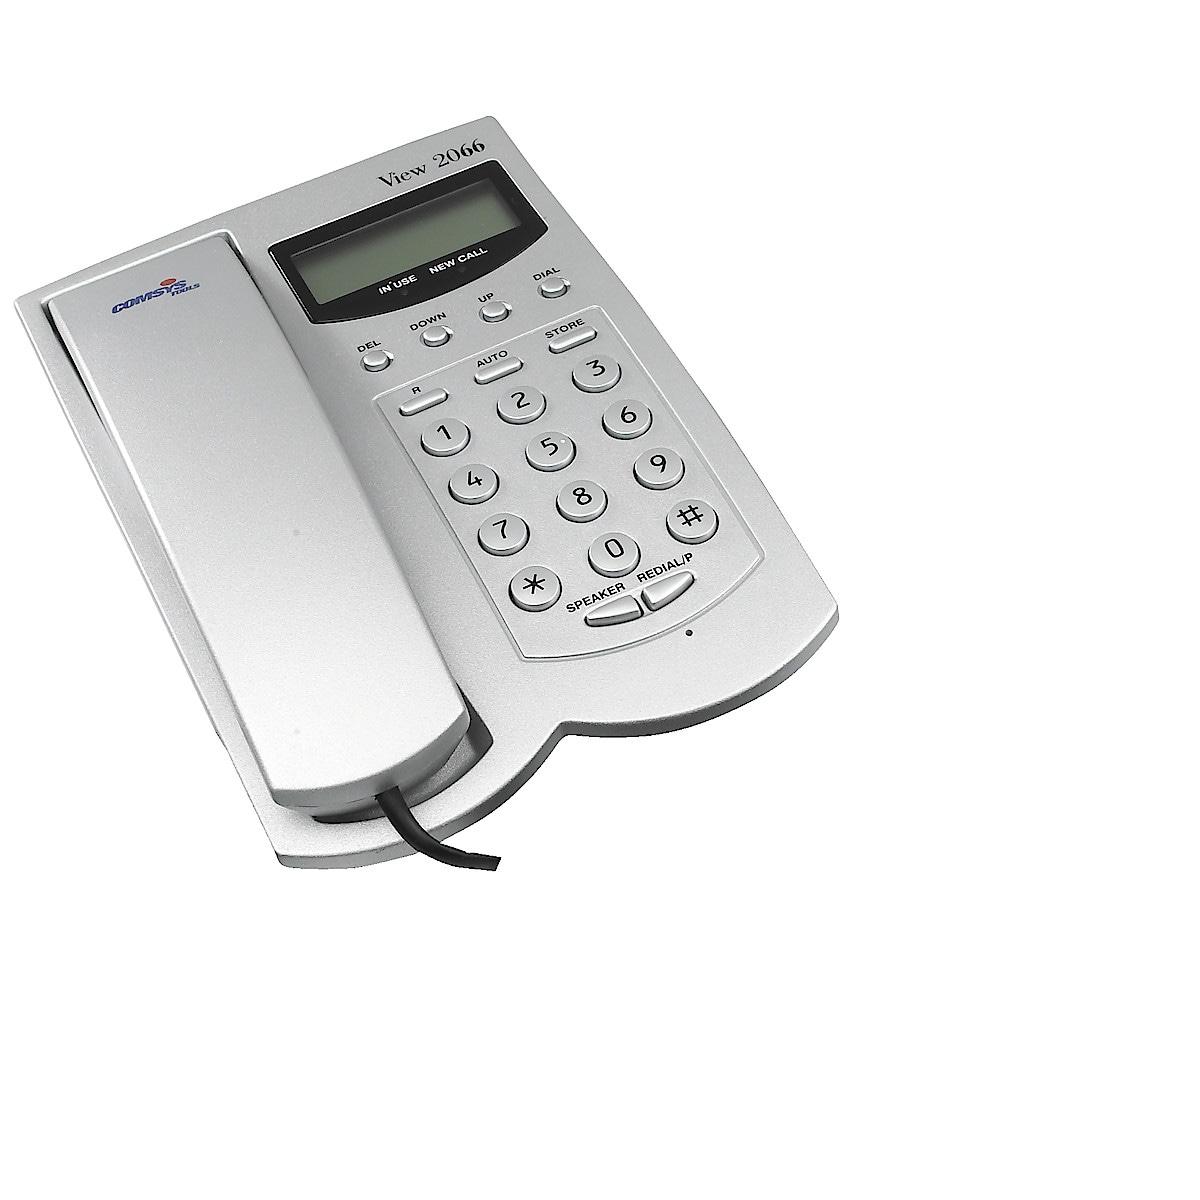 Comsys XL1000 Telephone